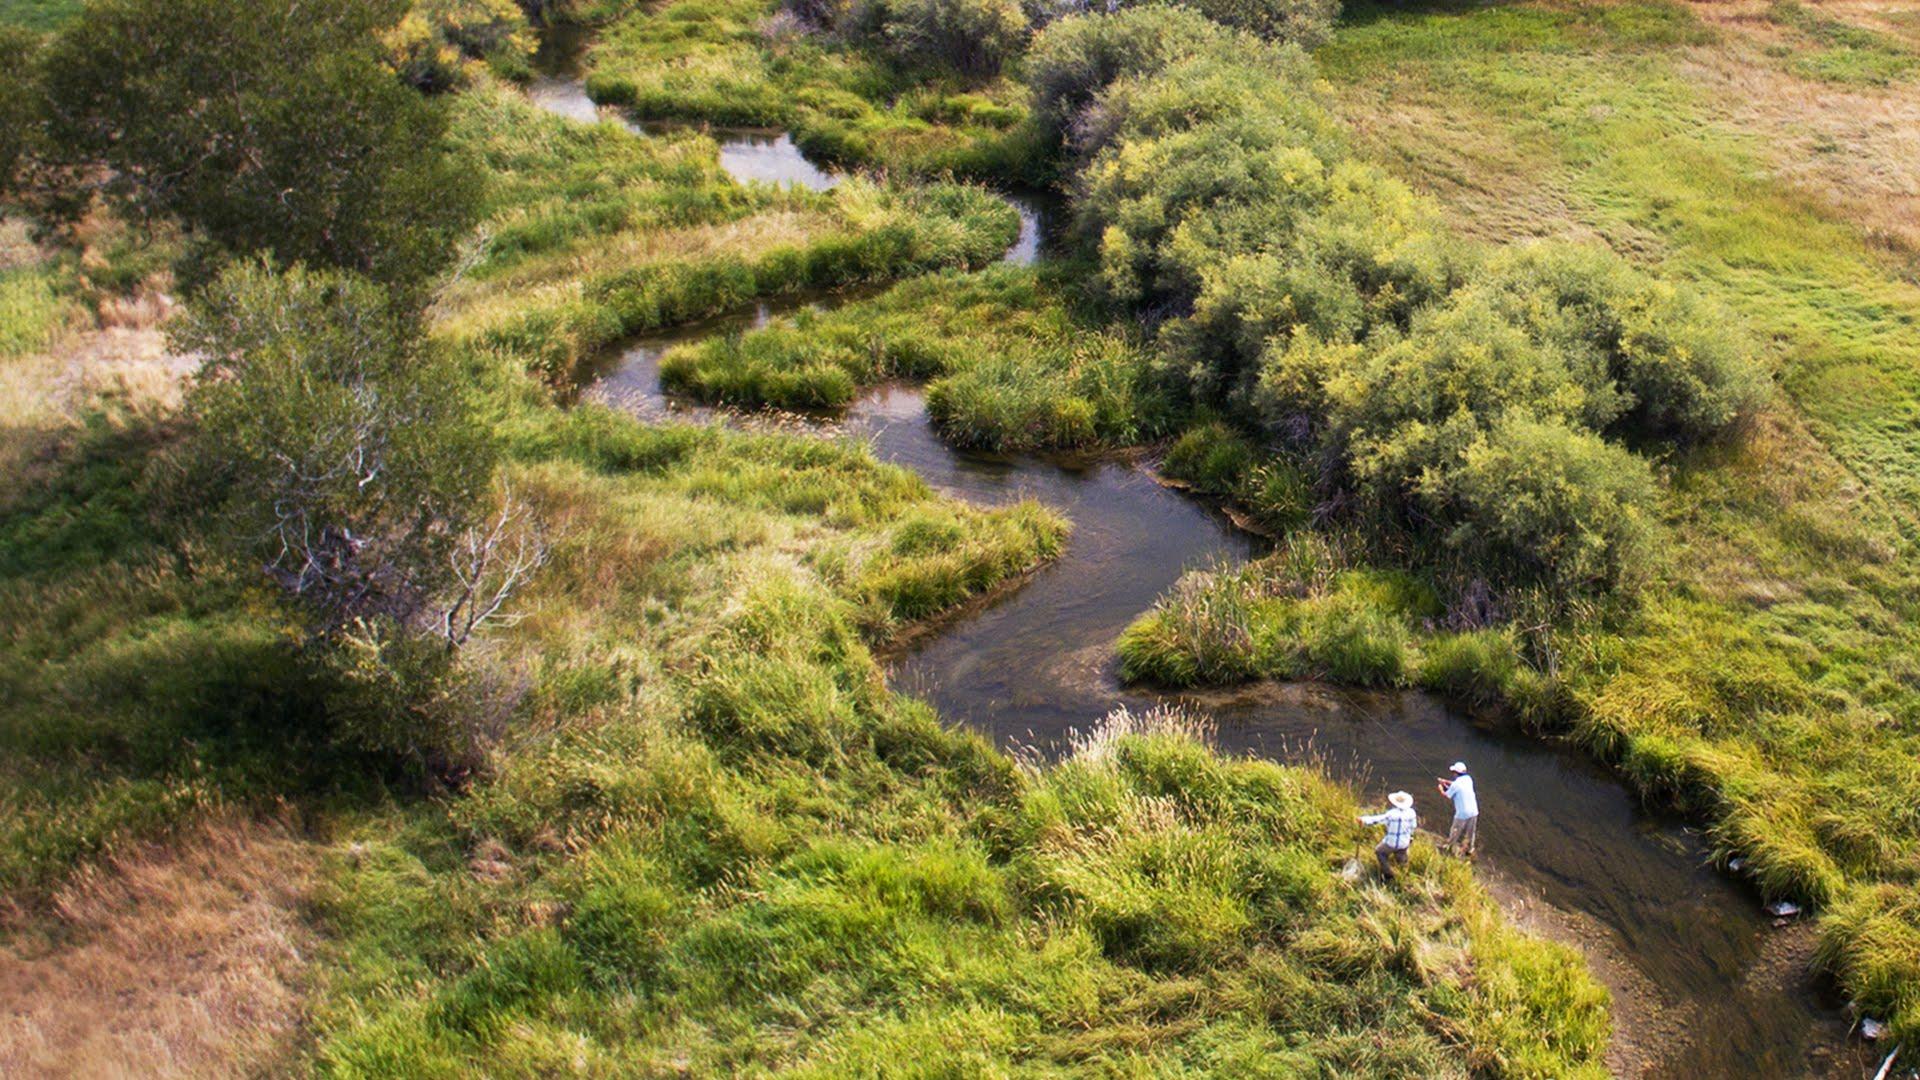 Fly Fishing Film — Spring Creek by Todd Moen